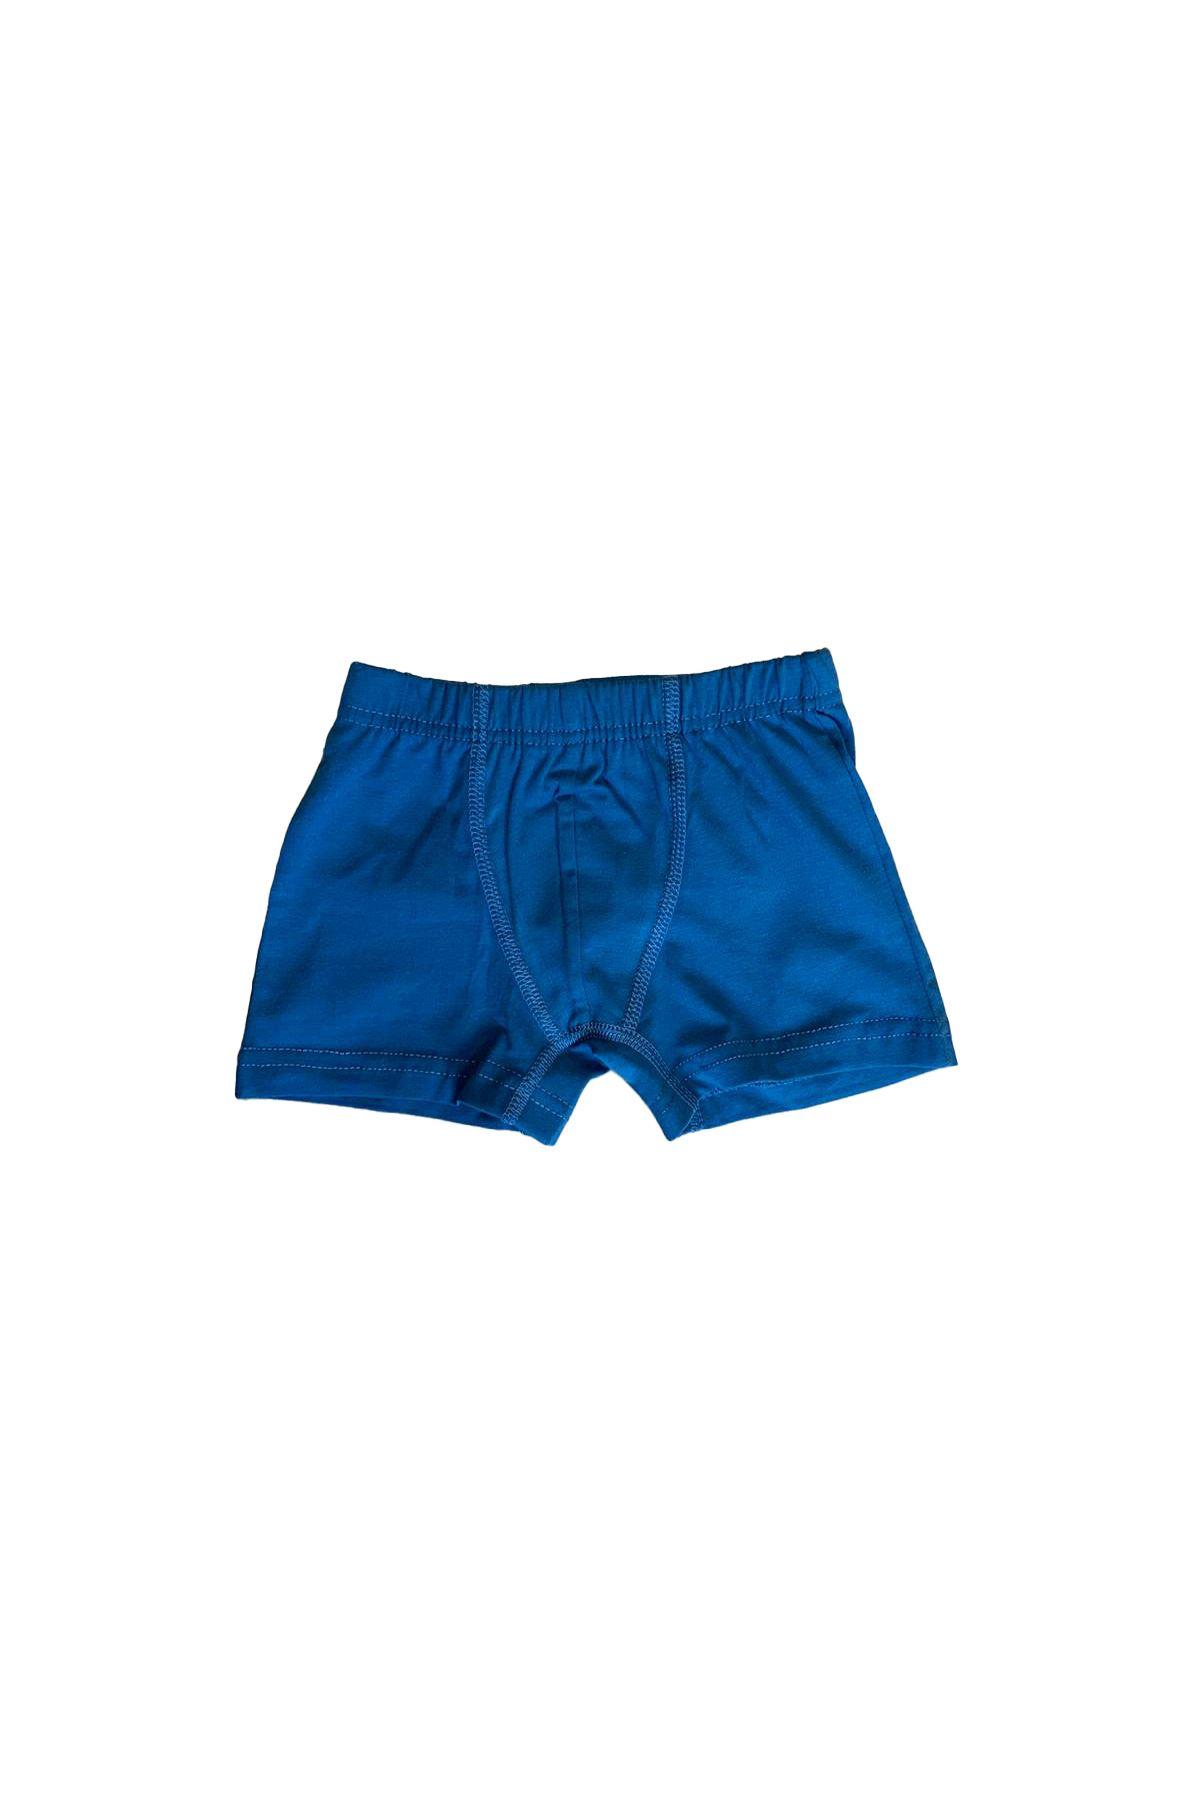 Mavi Erkek Çocuk Pamuklu Boxer 209